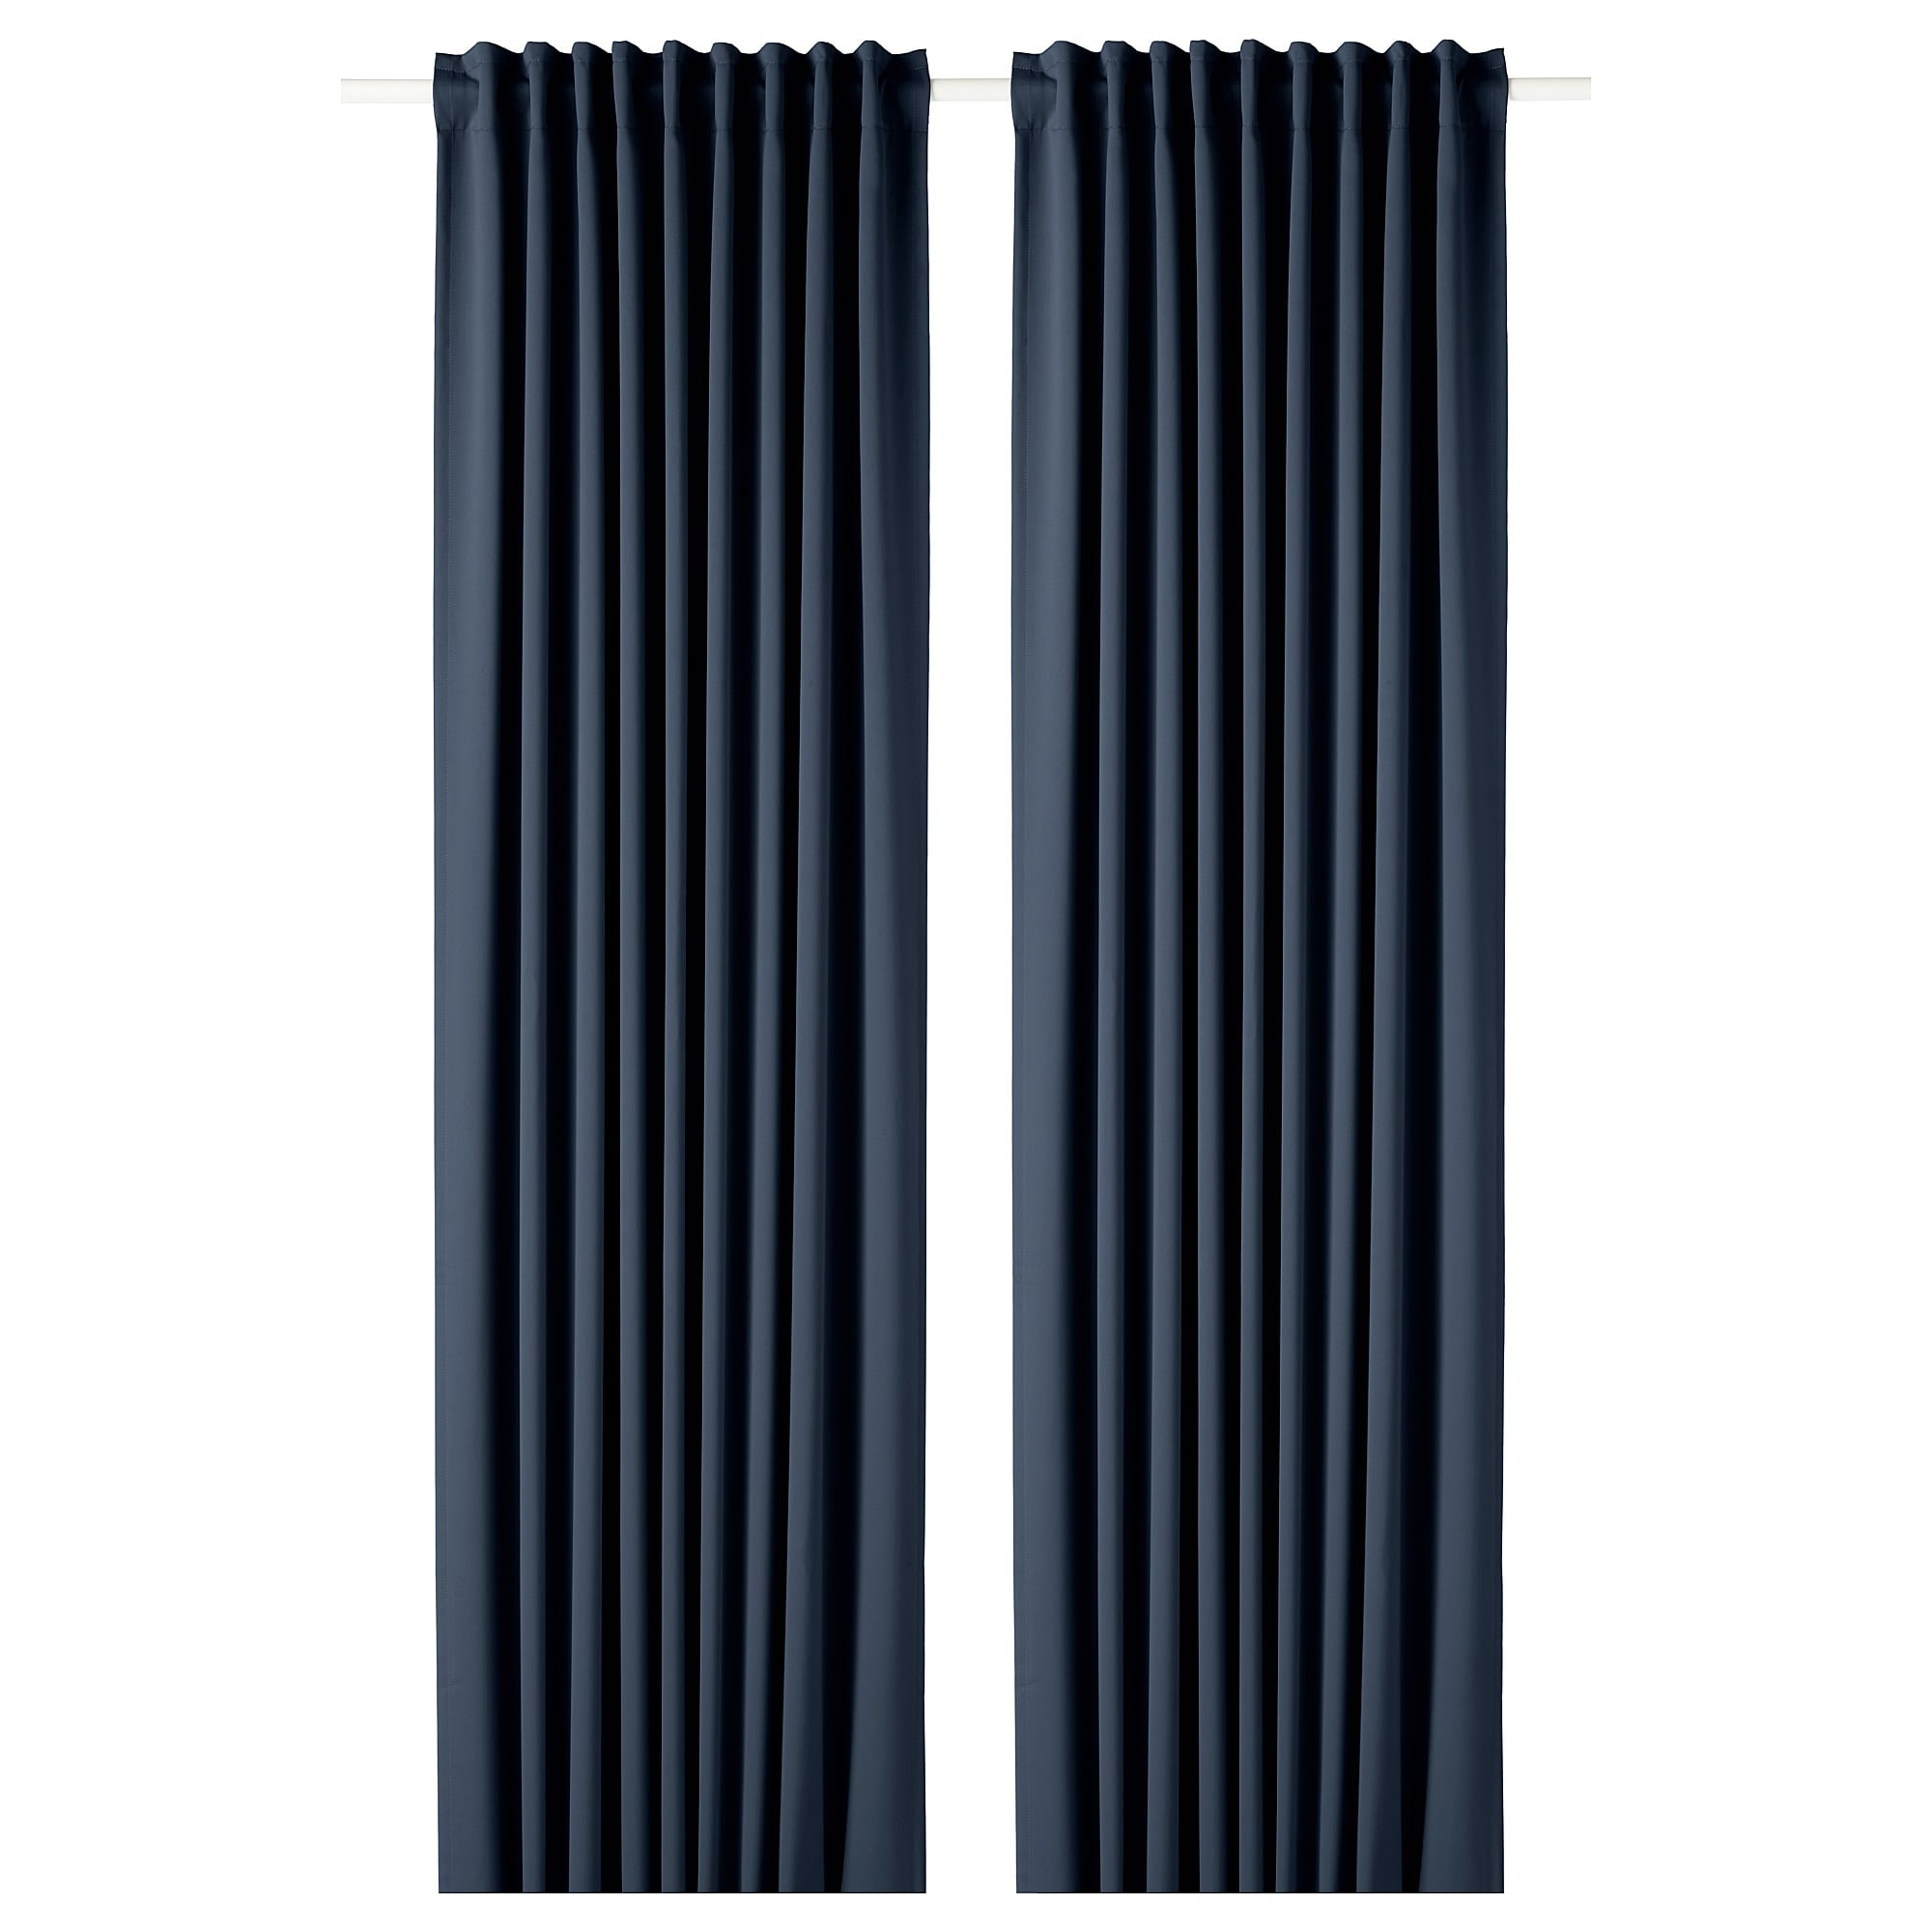 Majgull Blackout Curtains, 1 Pair, Dark Blue Pertaining To London Blackout Panel Pair (View 8 of 20)